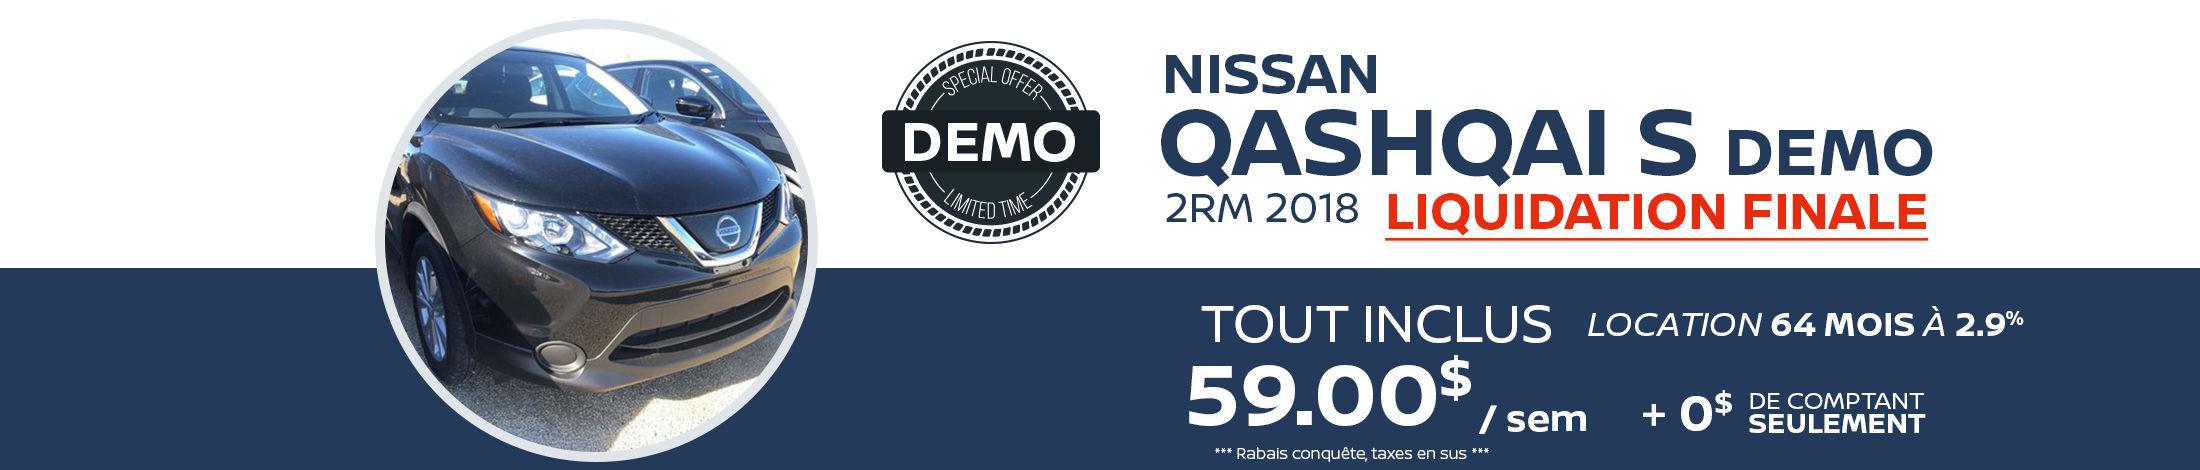 Qashqai S FWD Demo -2